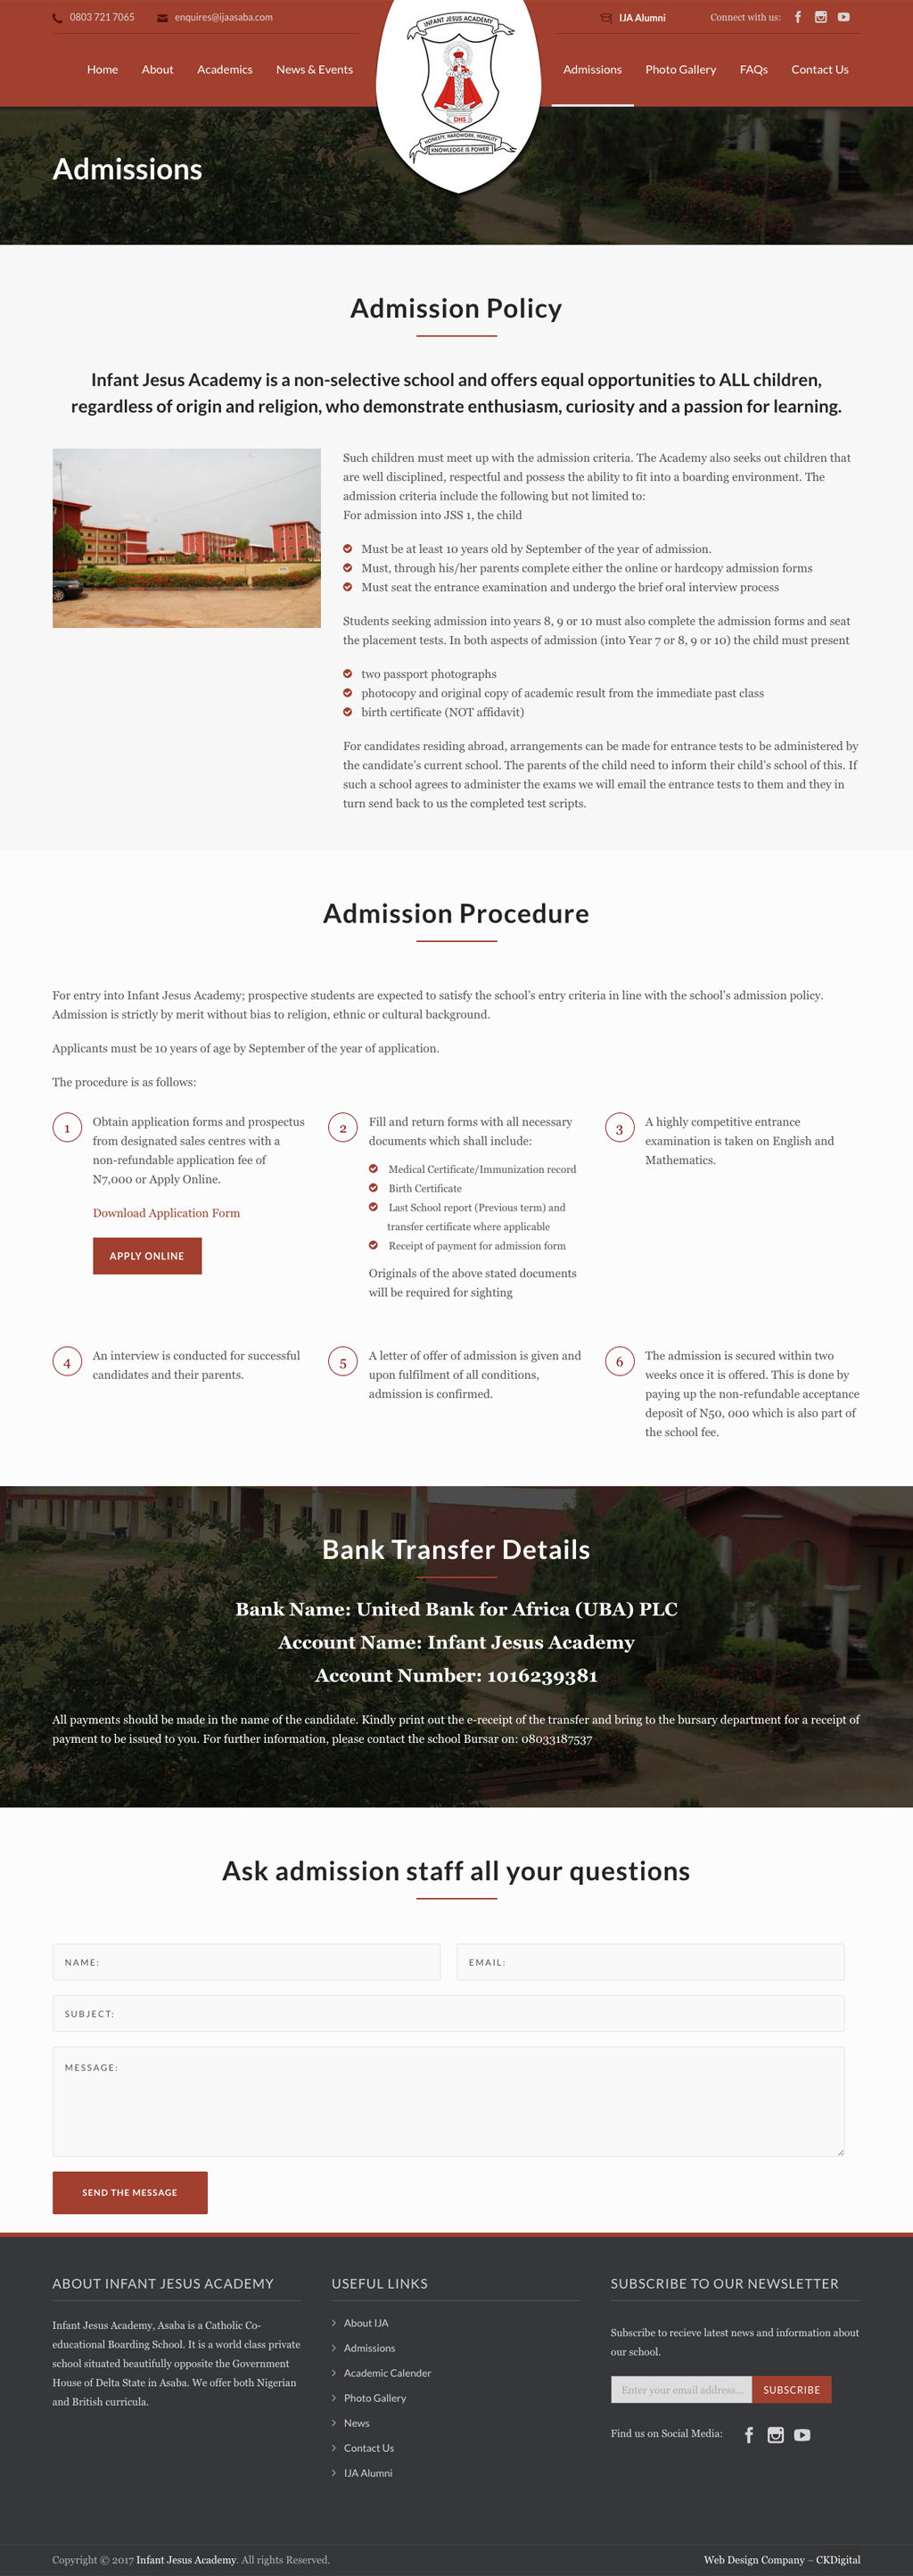 Admissions Page - Infant Jesus Academy Website Design